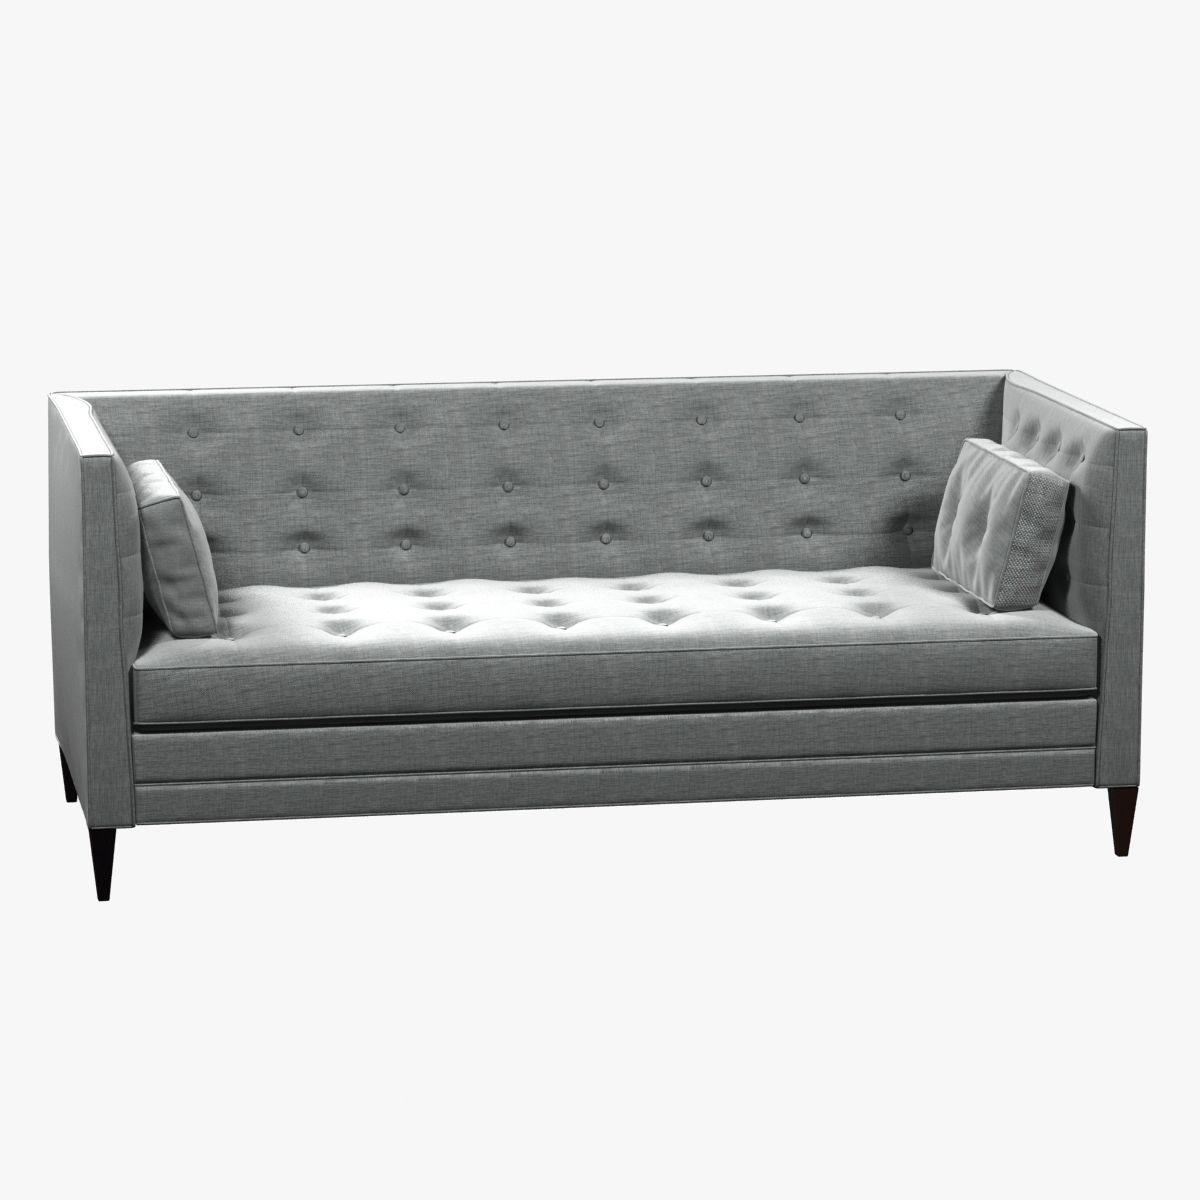 Clancy Tufted Upholstered Sofa In Vangogh Fog 3d Model Max Obj 3ds Fbx Mtl  ...